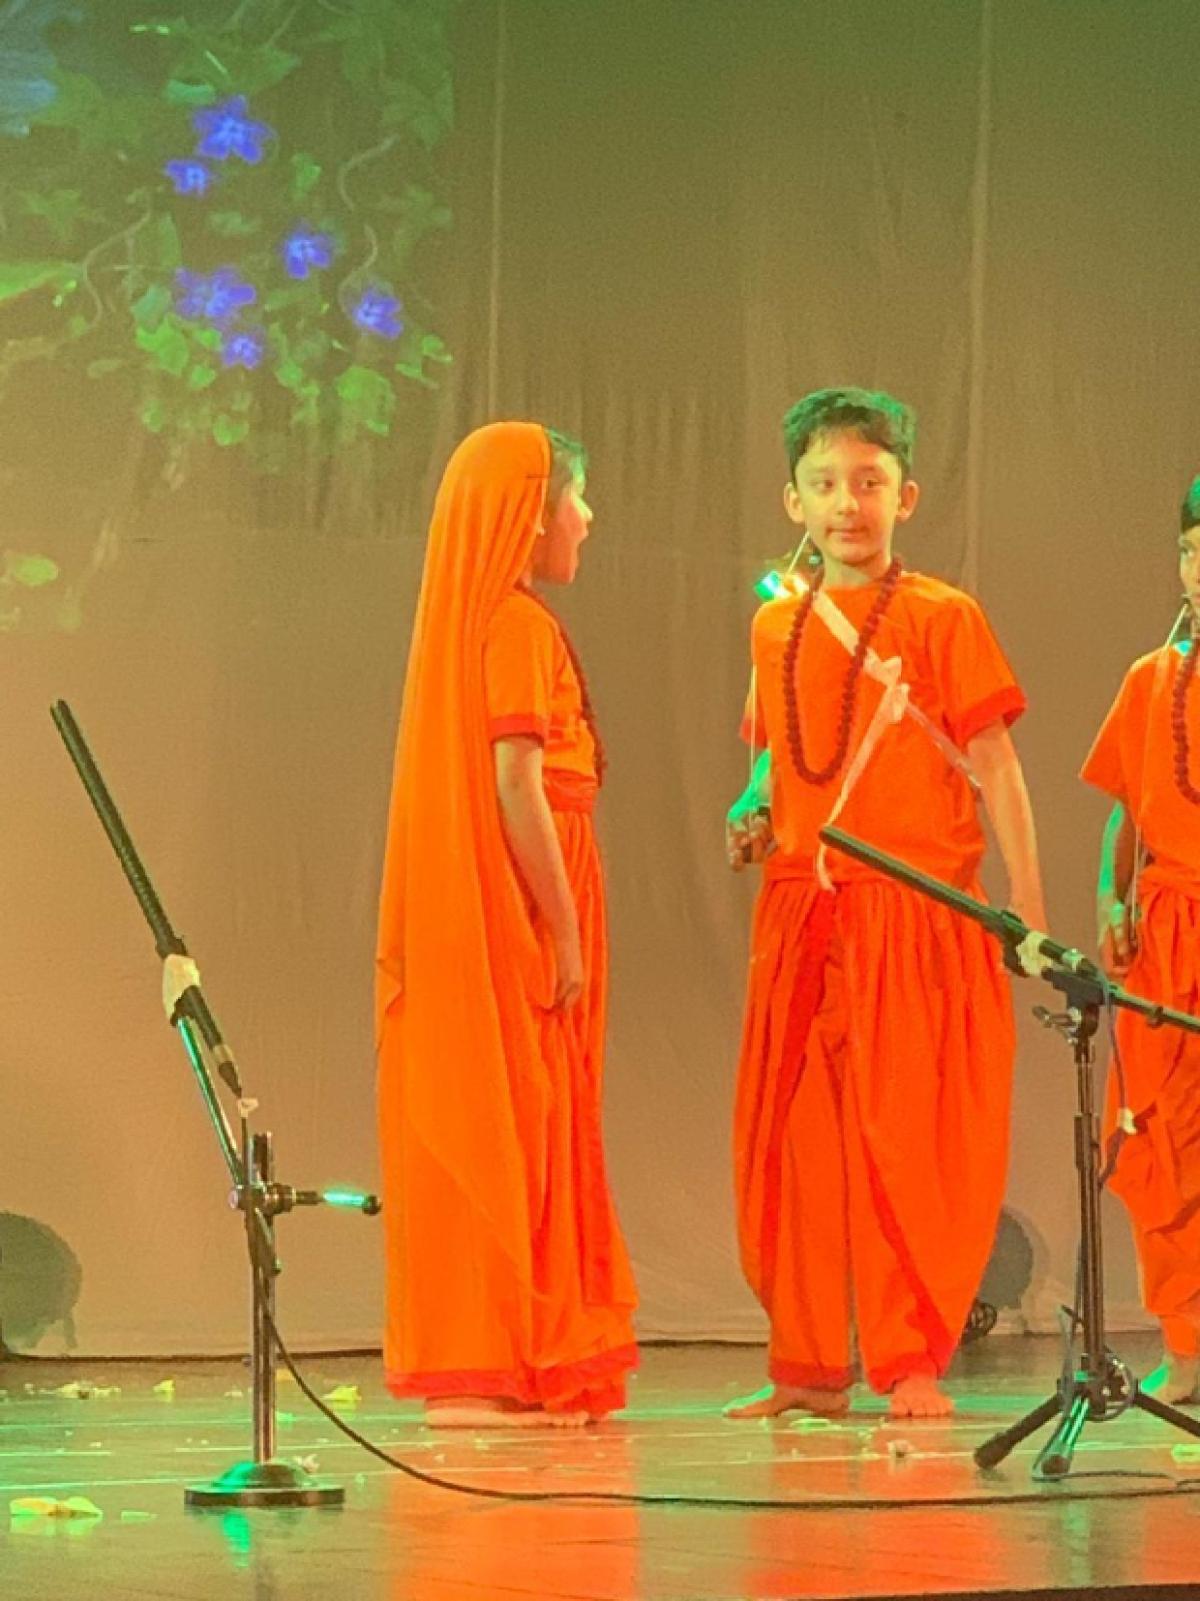 Ajay Devgn and Sanjay Dutt's sons play Ram and Raavan in school play Ramayana